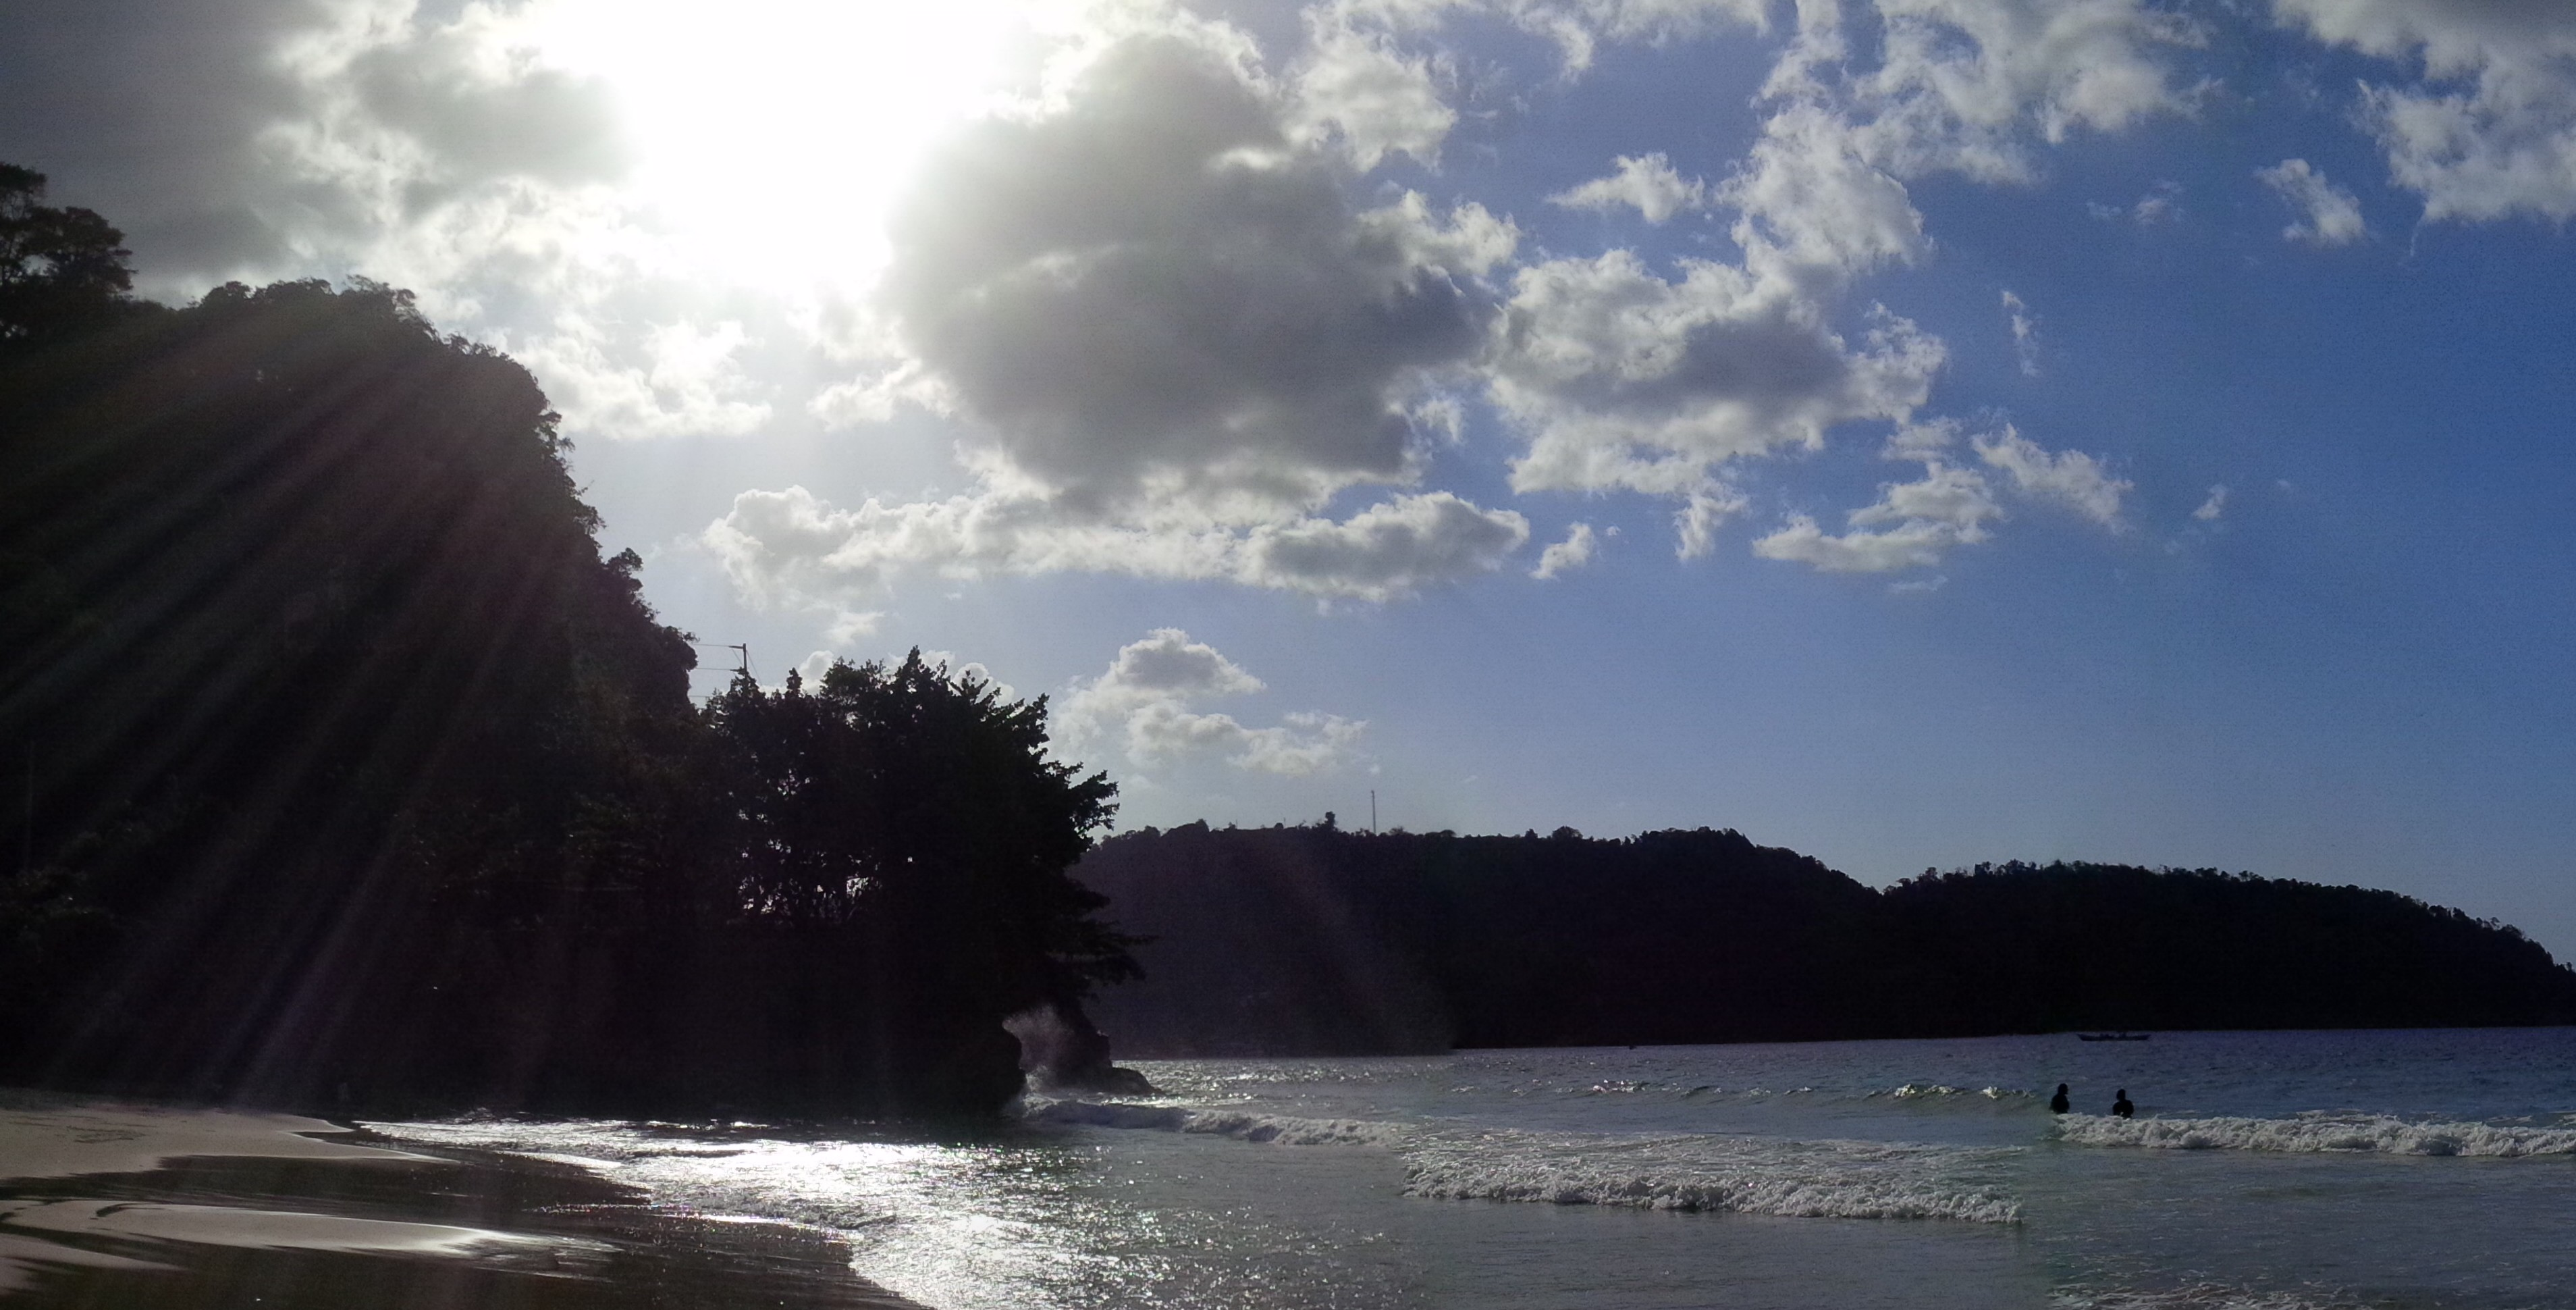 IMG_20150502_162649_panorama_edit